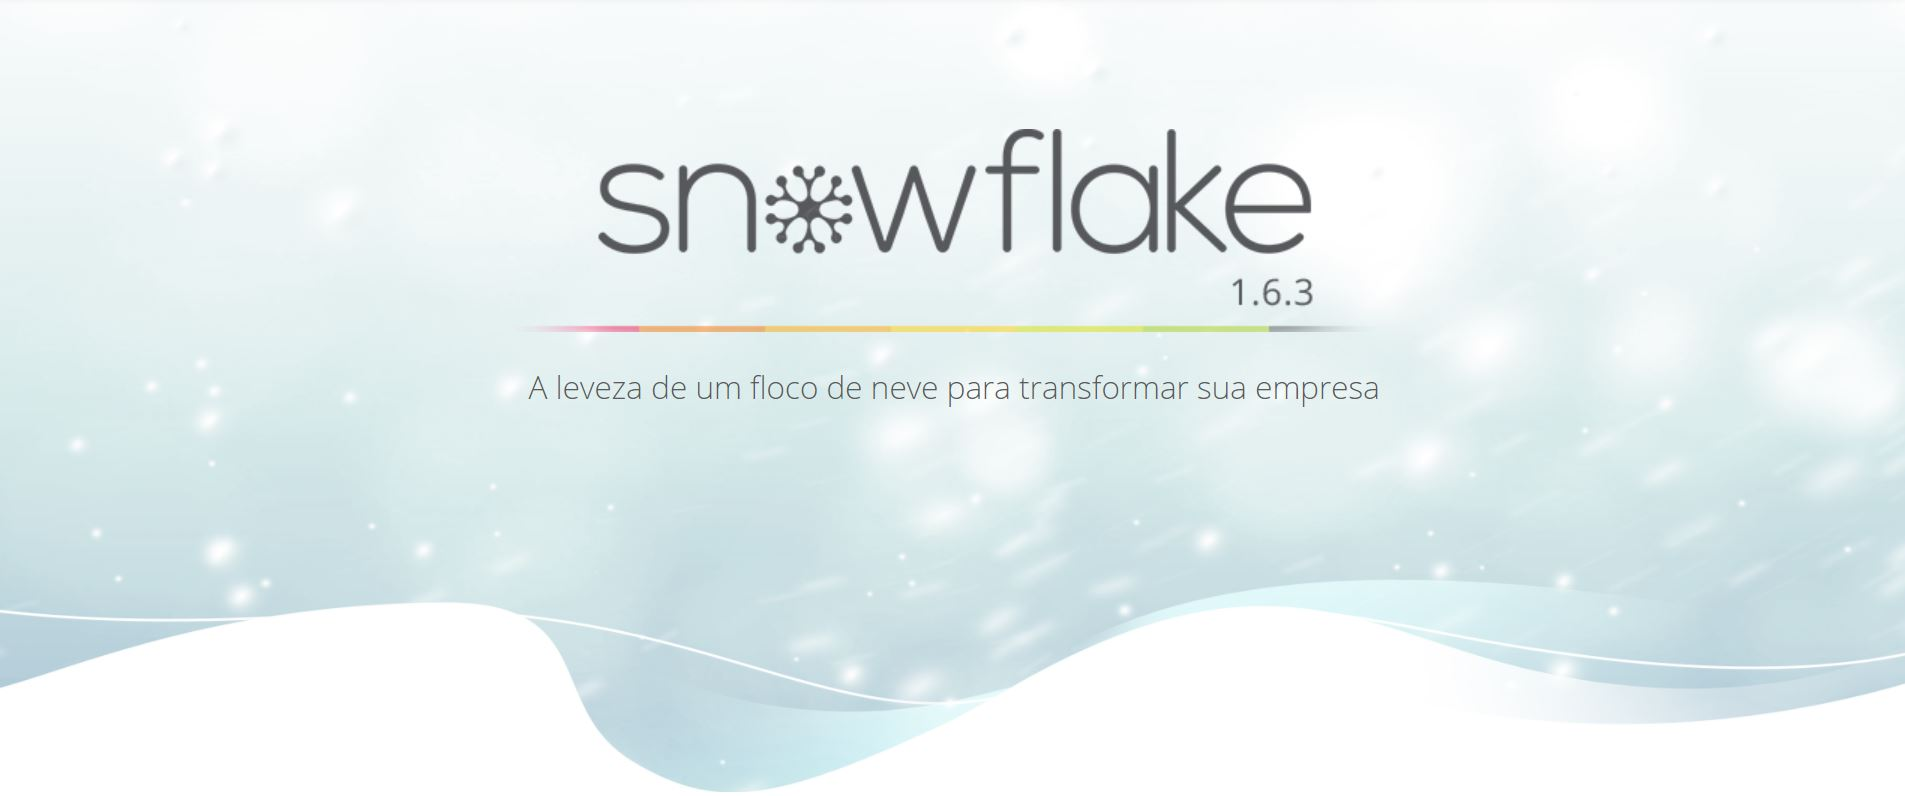 Snowflake%20 %201.6.3%20 %20destaque